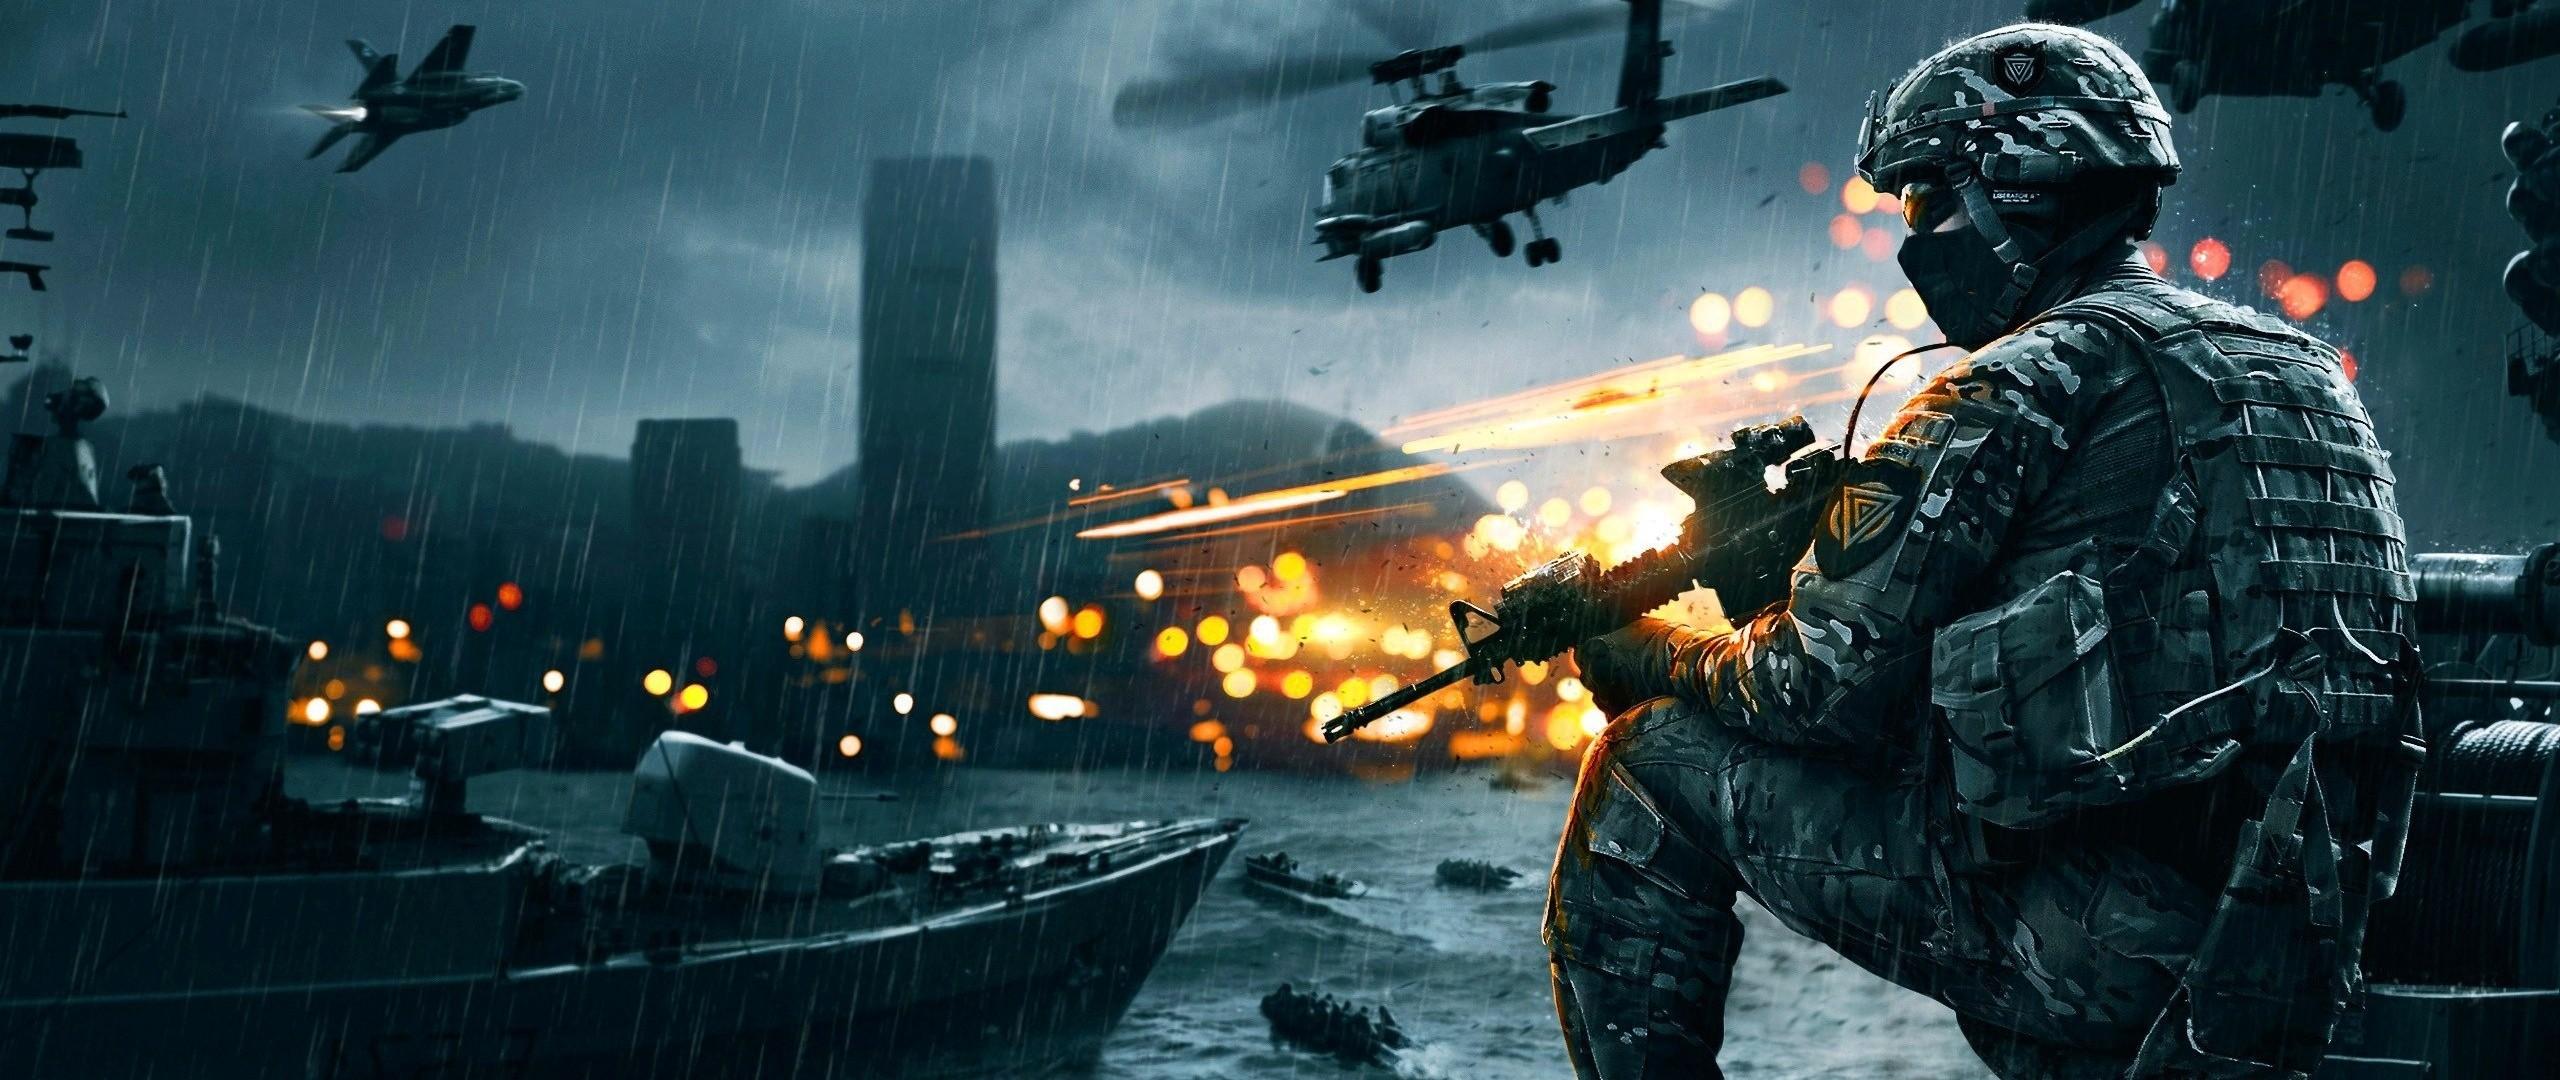 Preview wallpaper battlefield 4, game, ea digital illusions ce 2560×1080